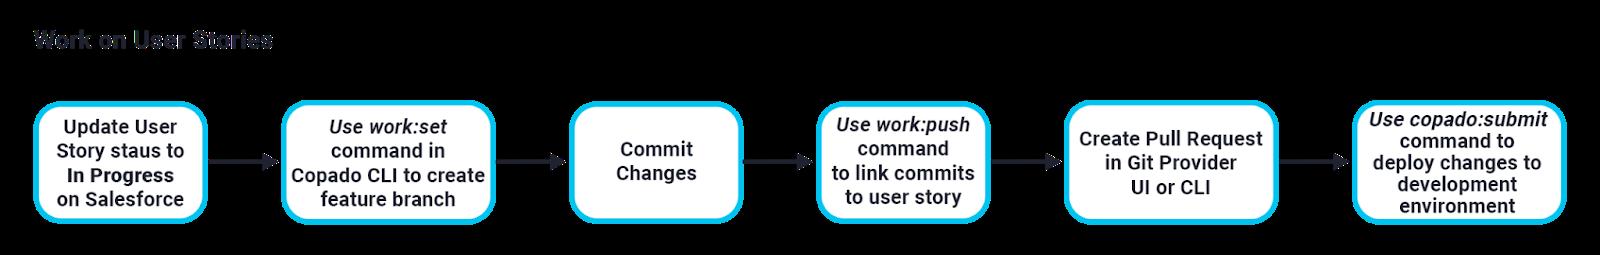 Work on user stories diagram